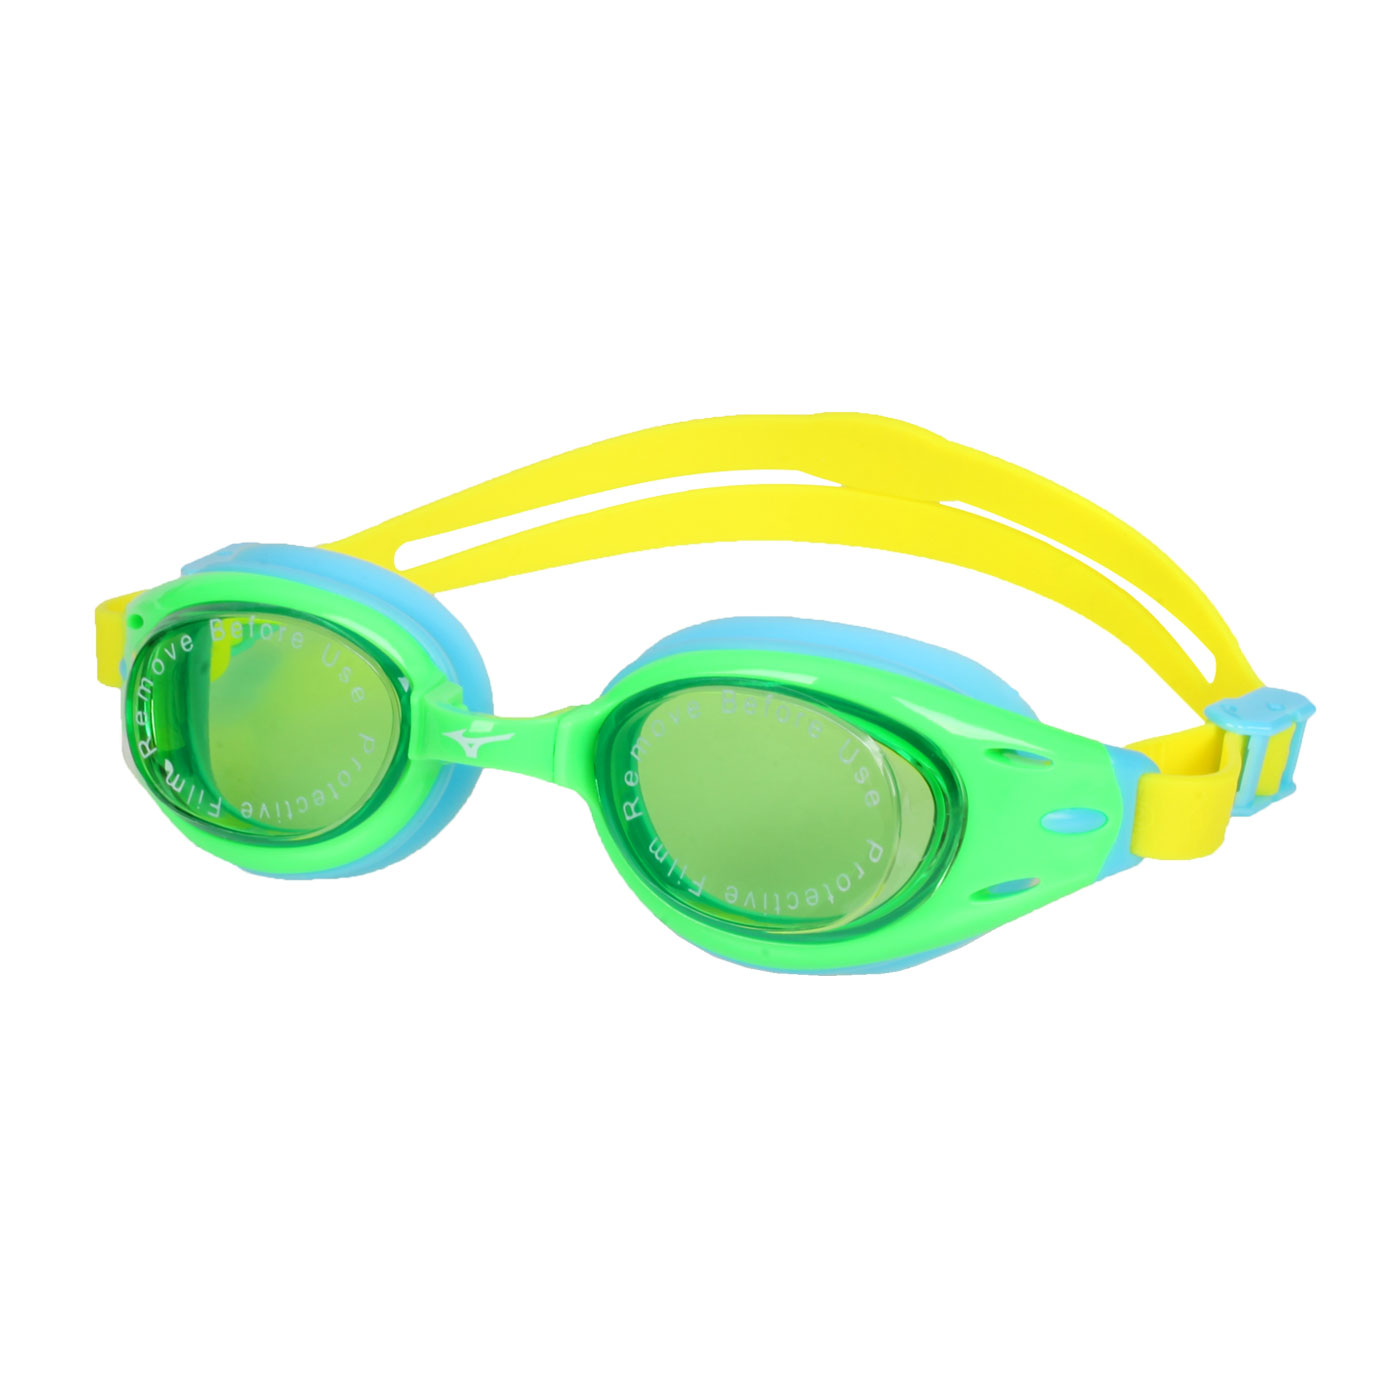 MIZUNO 兒童泳鏡  SWIMN3TF105000-37 - 水藍綠黃